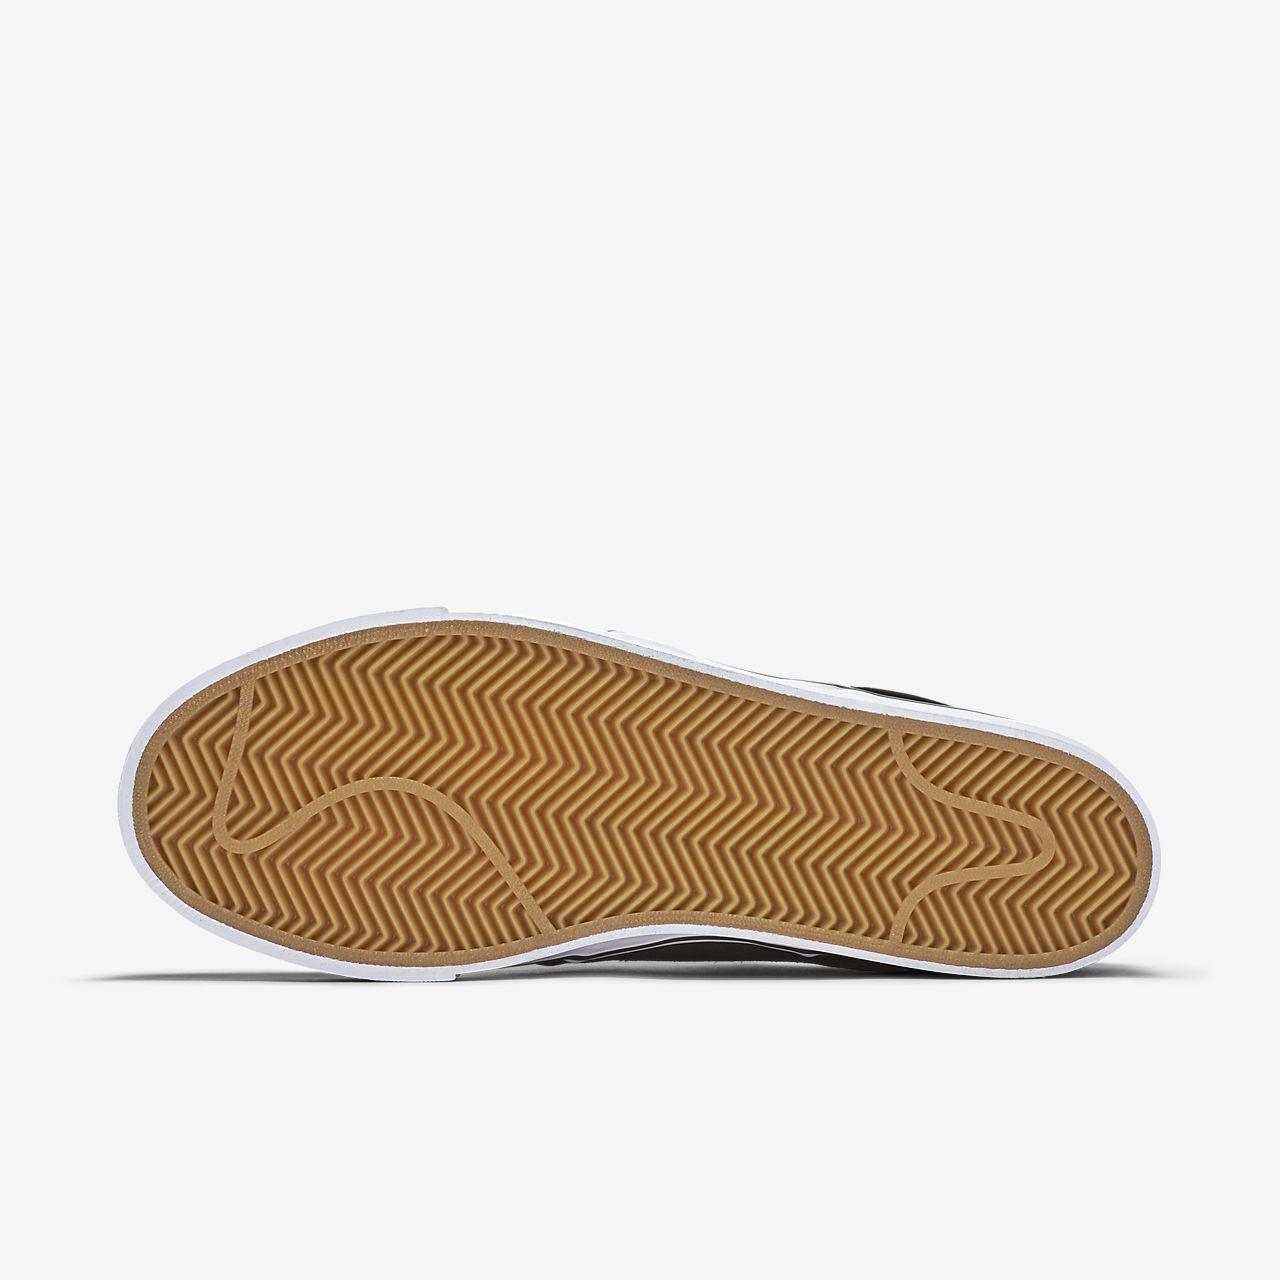 check out 24727 9cd4c ... Nike SB Zoom Stefan Janoski OG Men s Skate Shoe